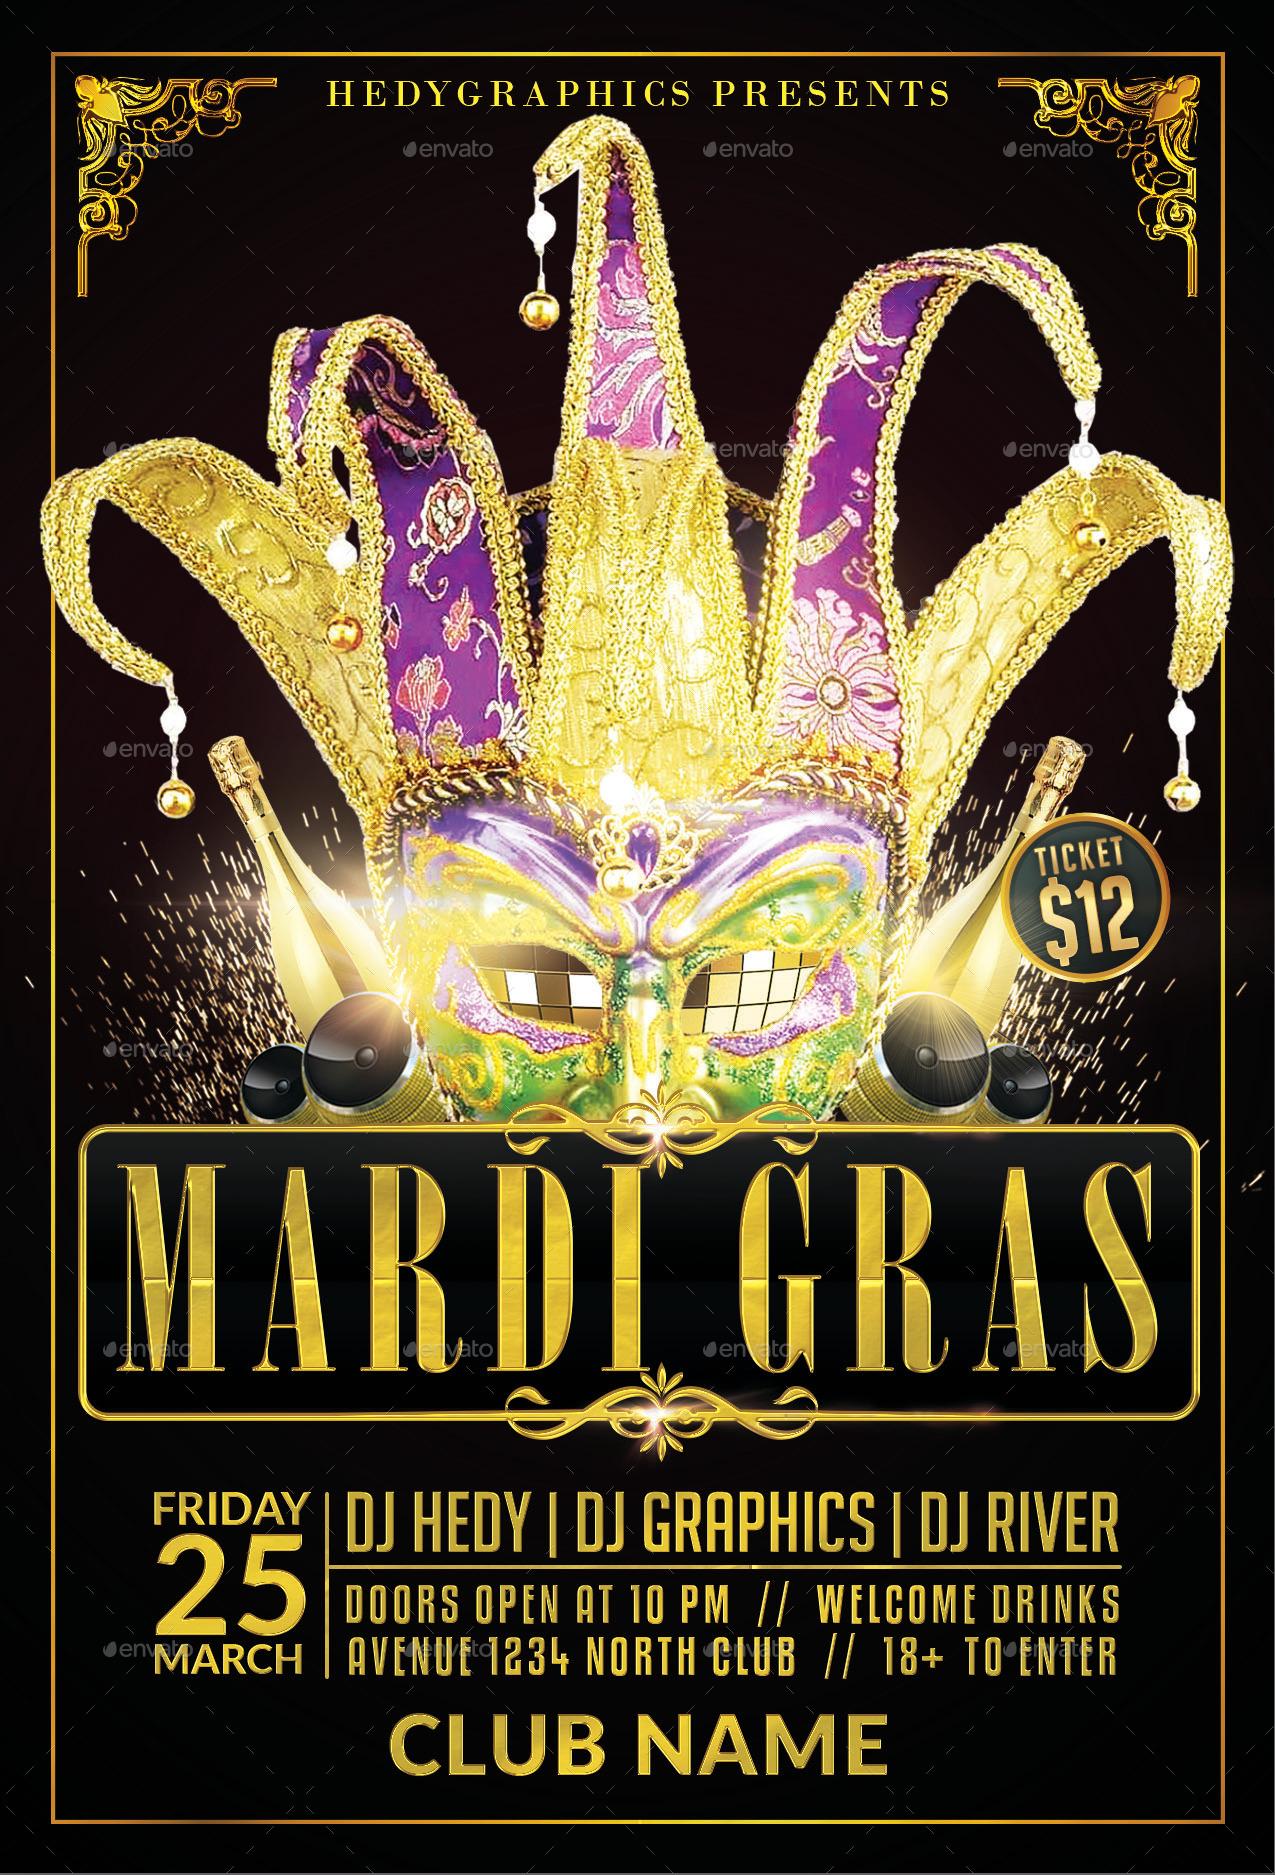 Carnival mardi gras flyer template by hedygraphics graphicriver carnival mardi gras flyer template events flyers previewspreview 1g saigontimesfo